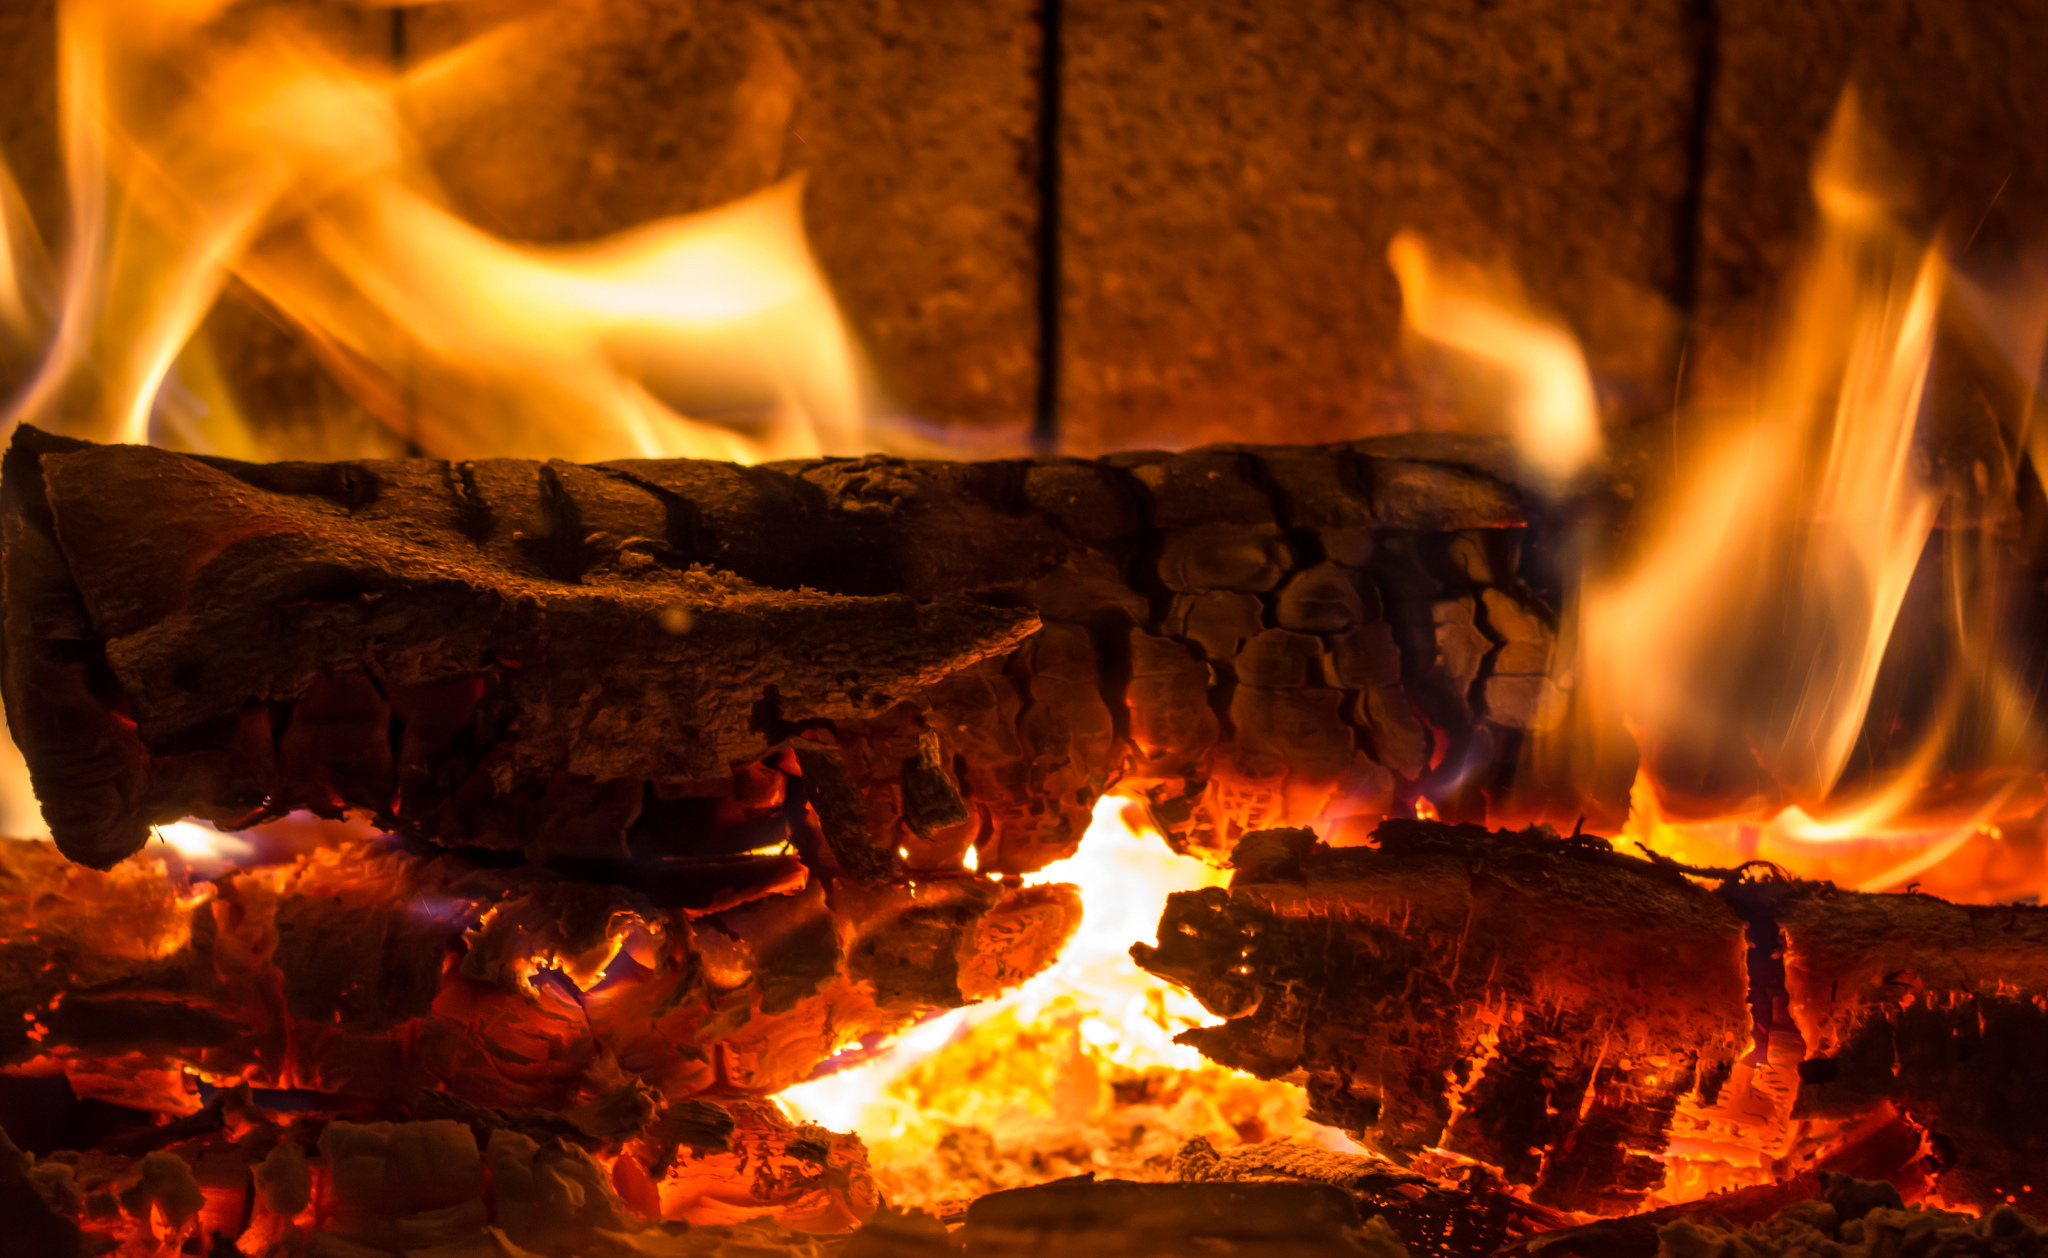 fireplace firewood flicker flame christmas - HD2048×1258